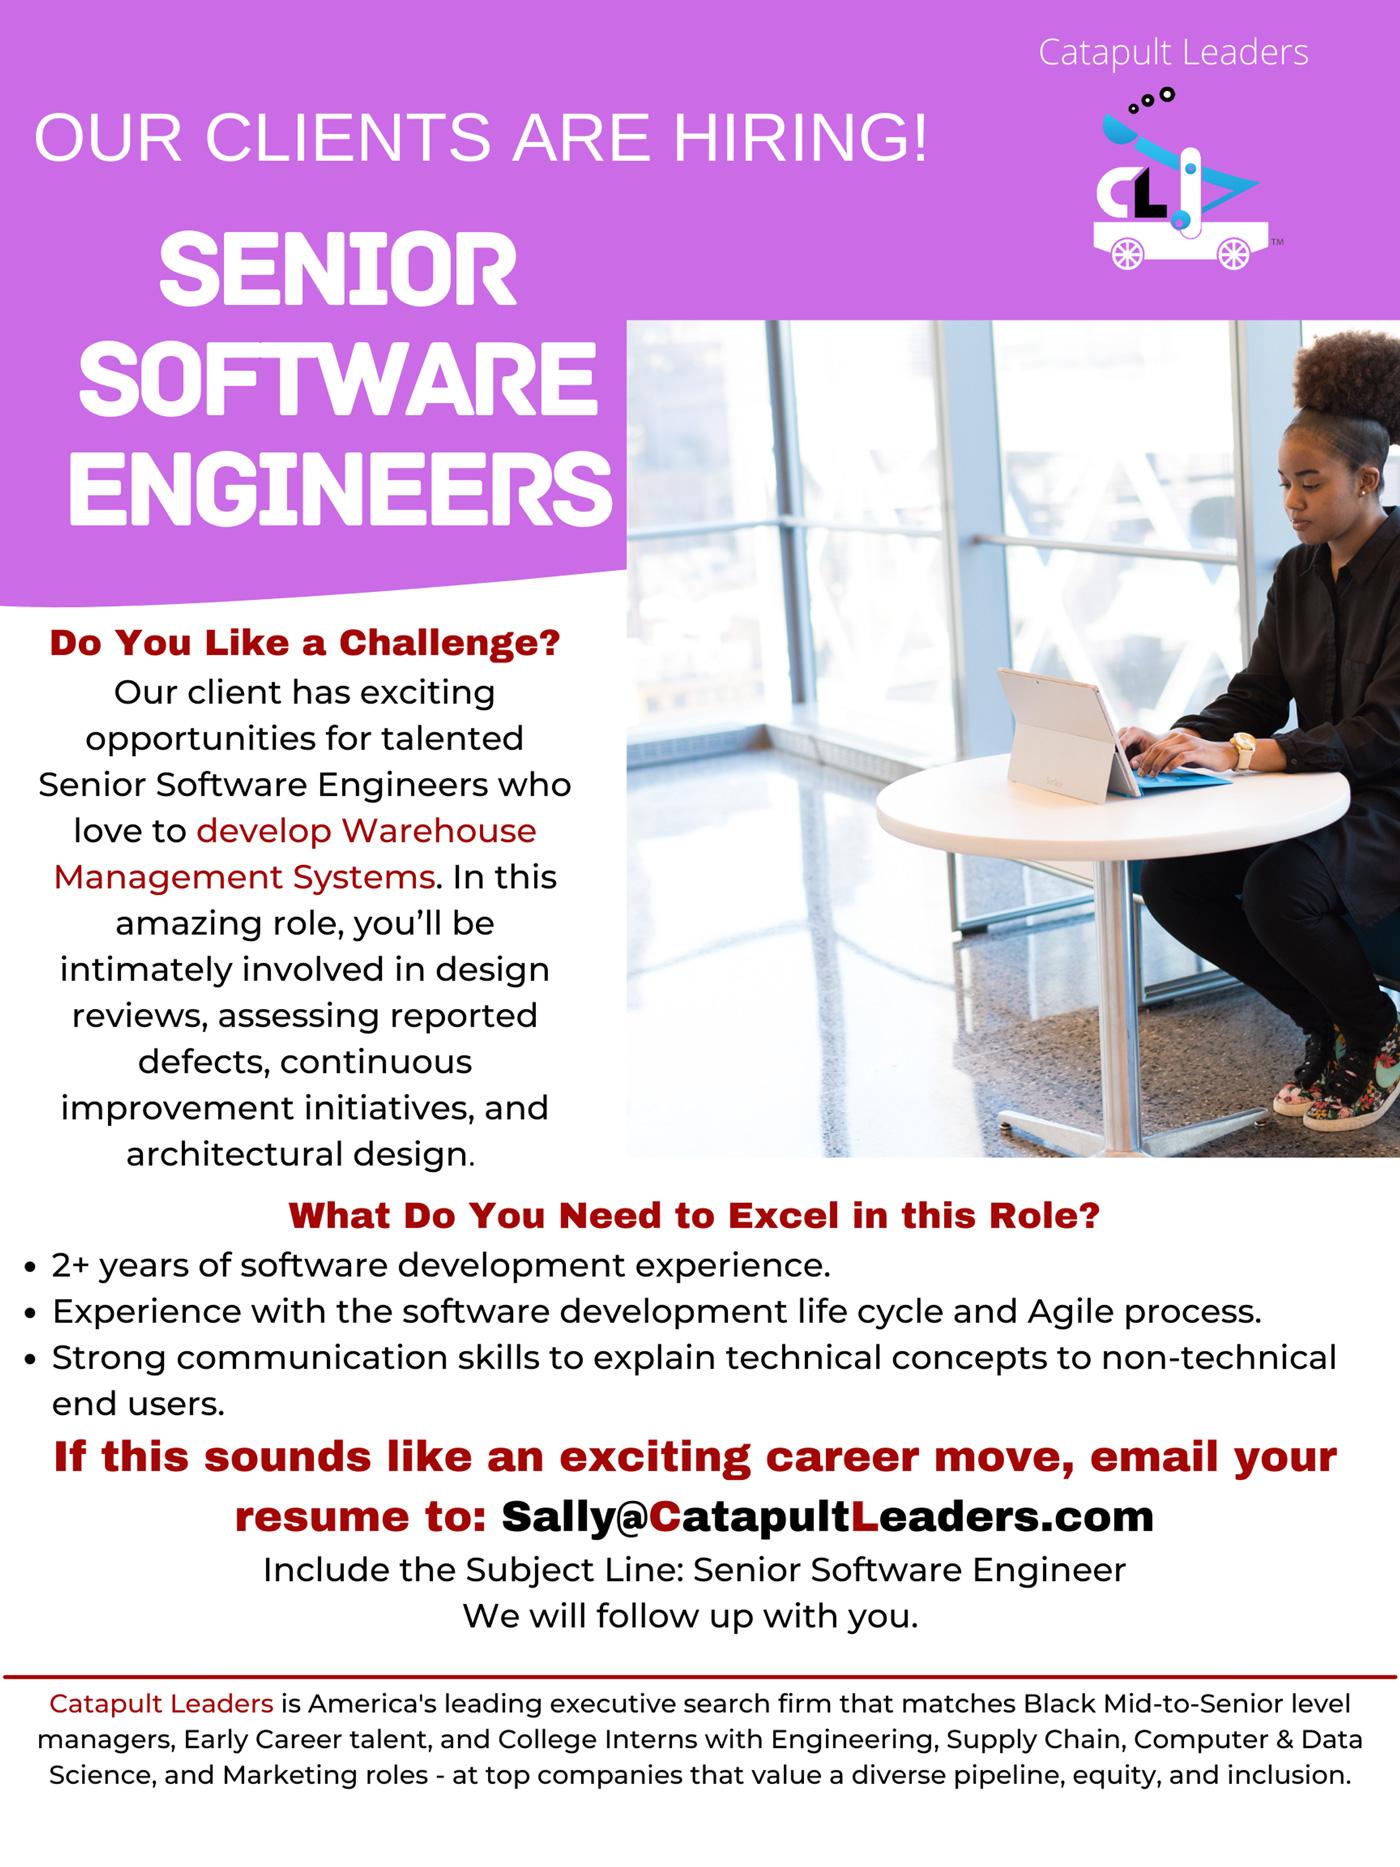 Senior Software Engineer Jobs - Catapult Leaders